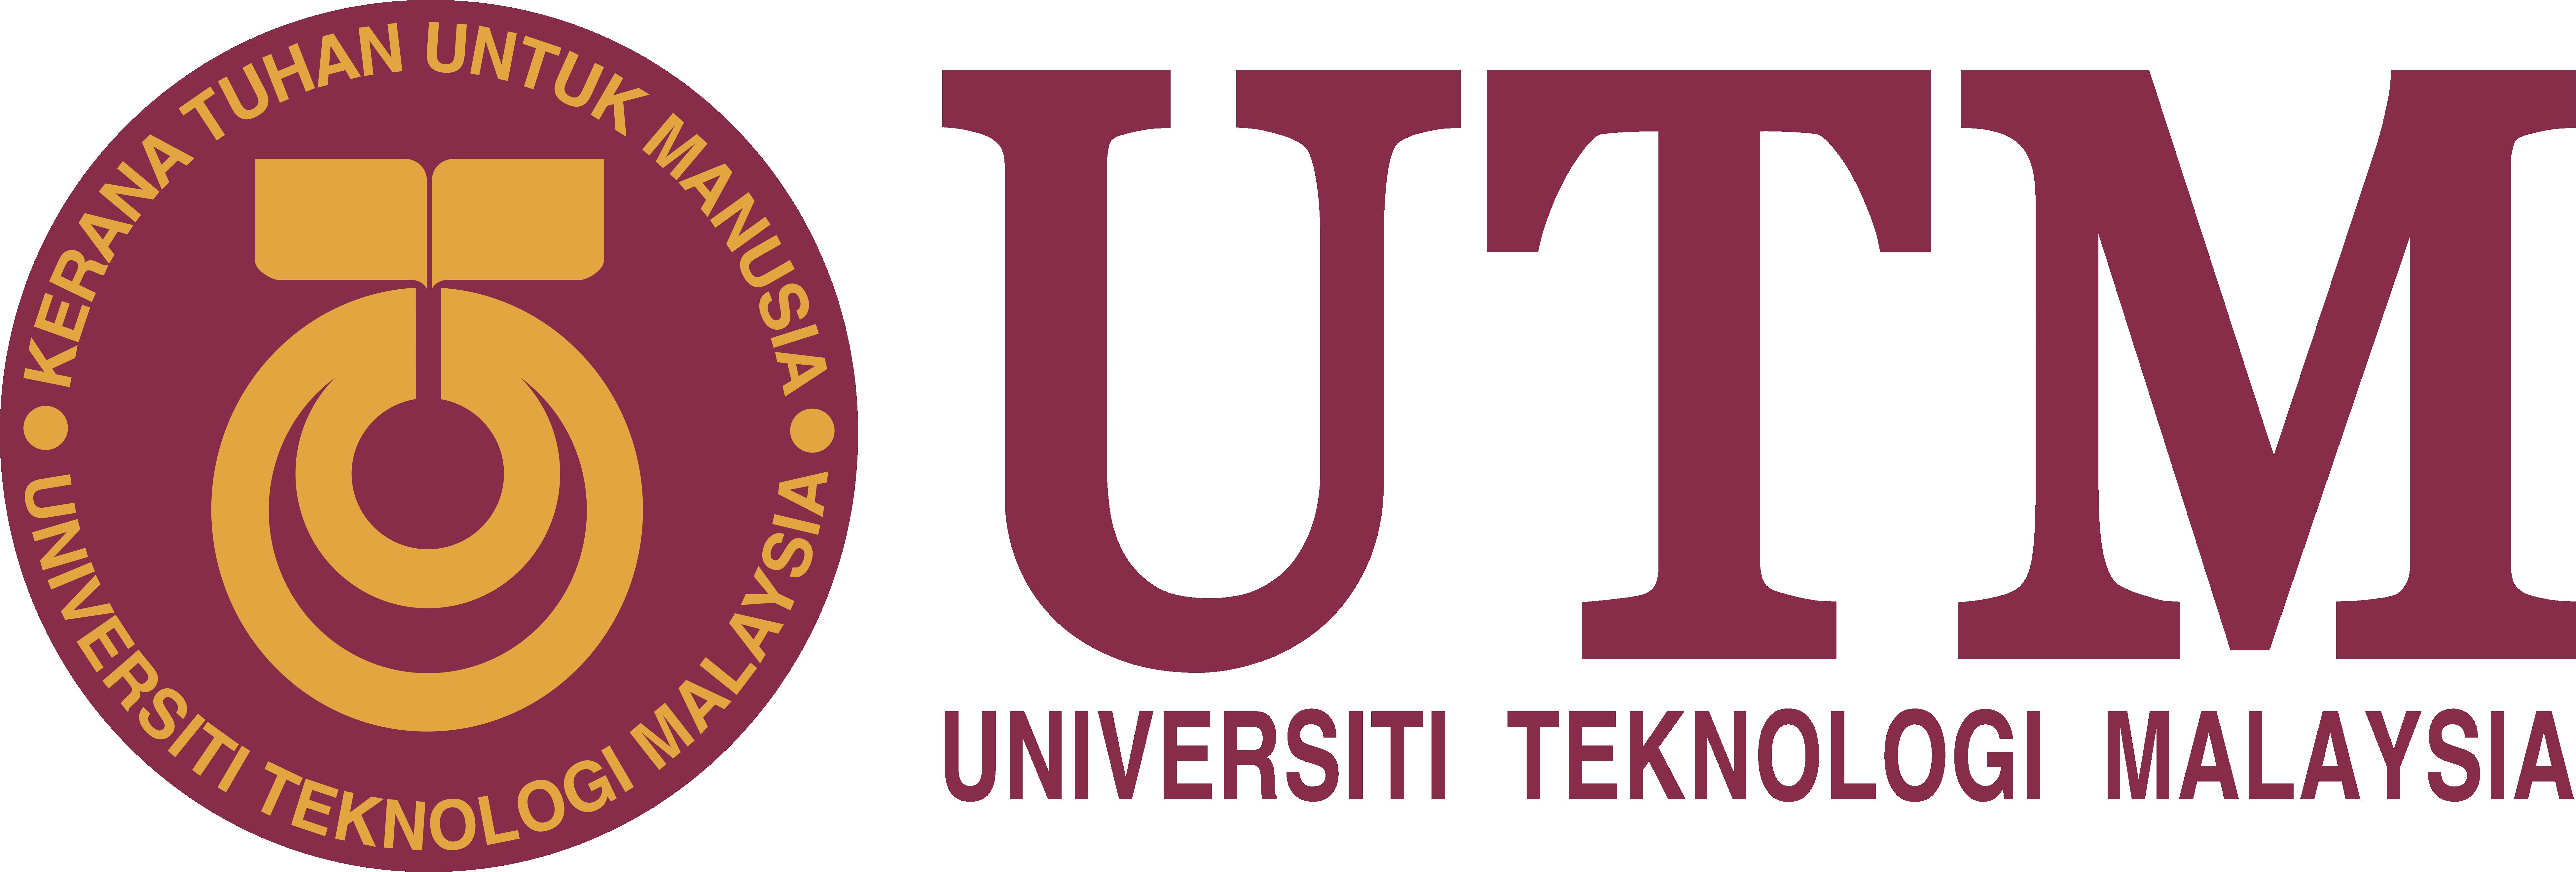 Dr Siti Ernieyanti Hashim